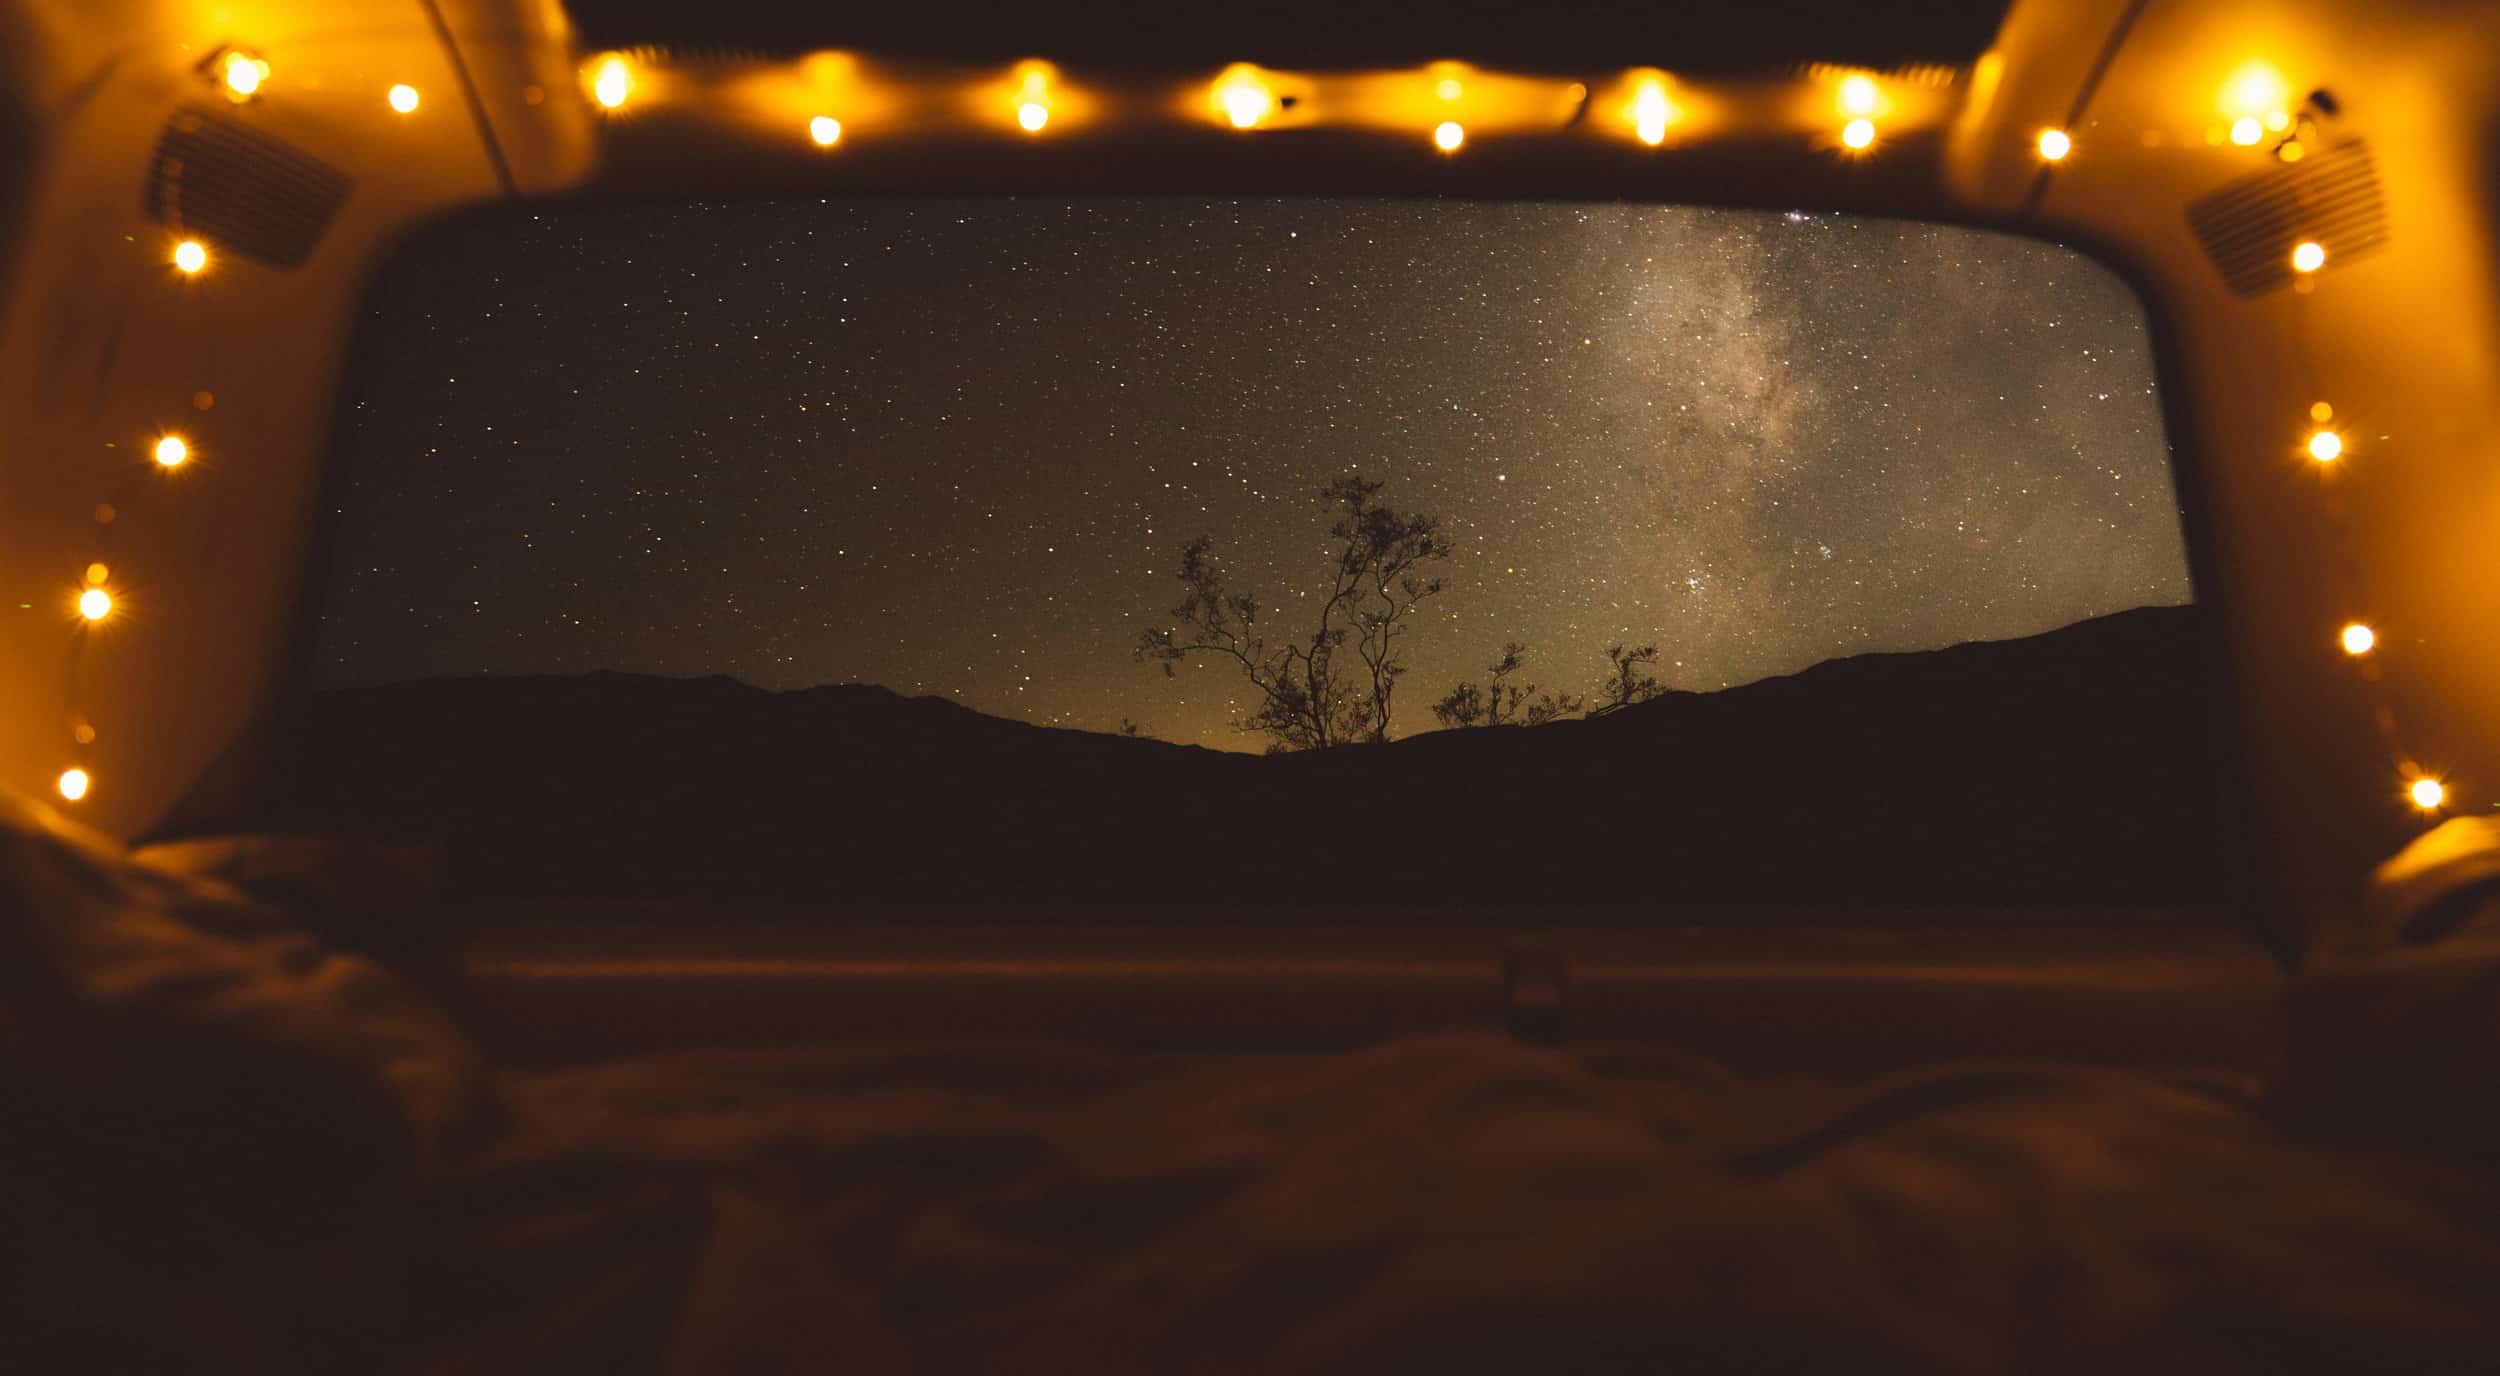 A starry night sky awaits beyond the open doors of a campervan.